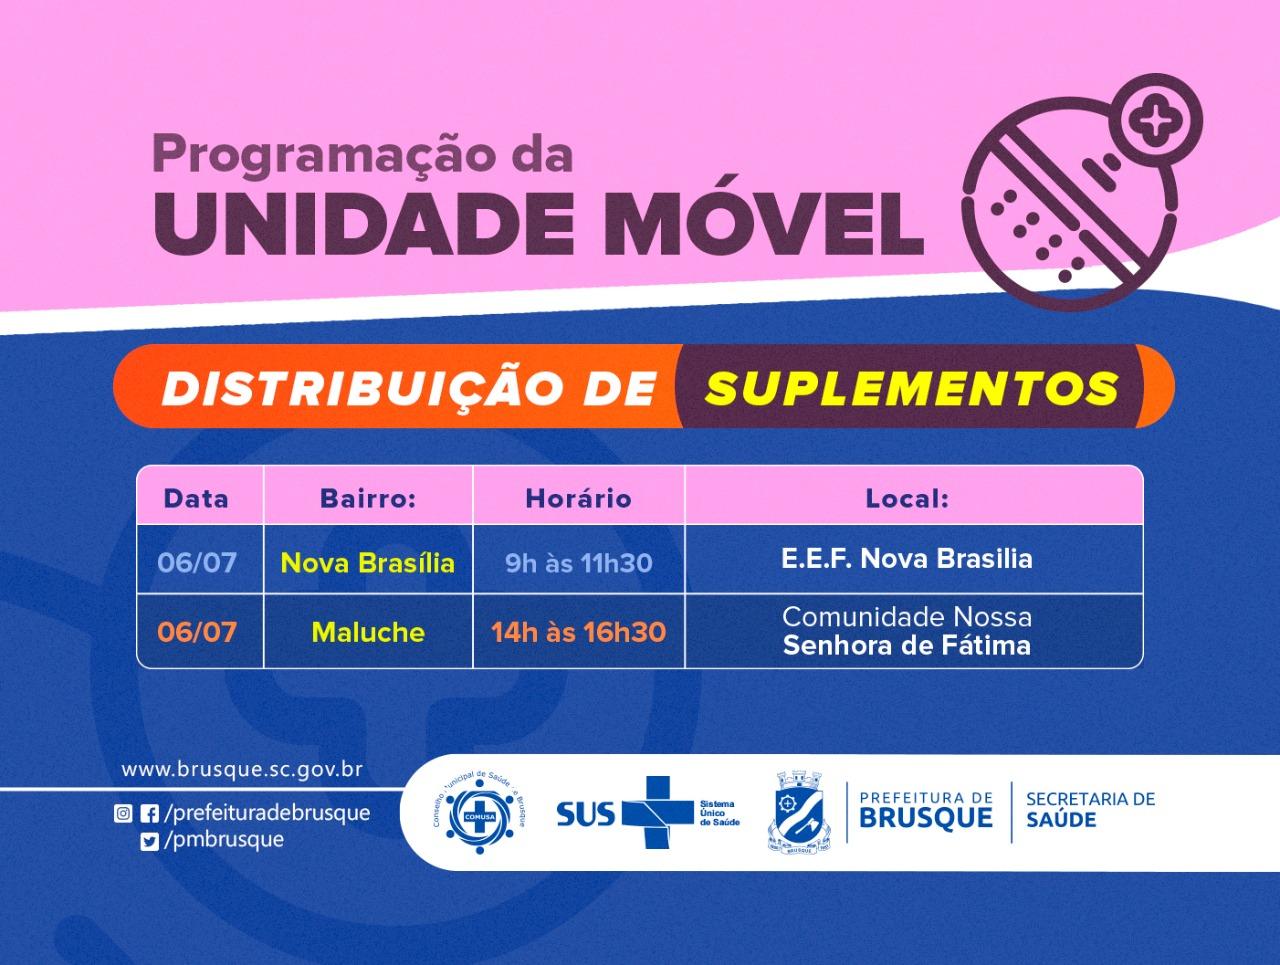 Covid-19: Unidade Móvel distribui suplementos na Nova Brasília e no Maluche nesta terça-feira